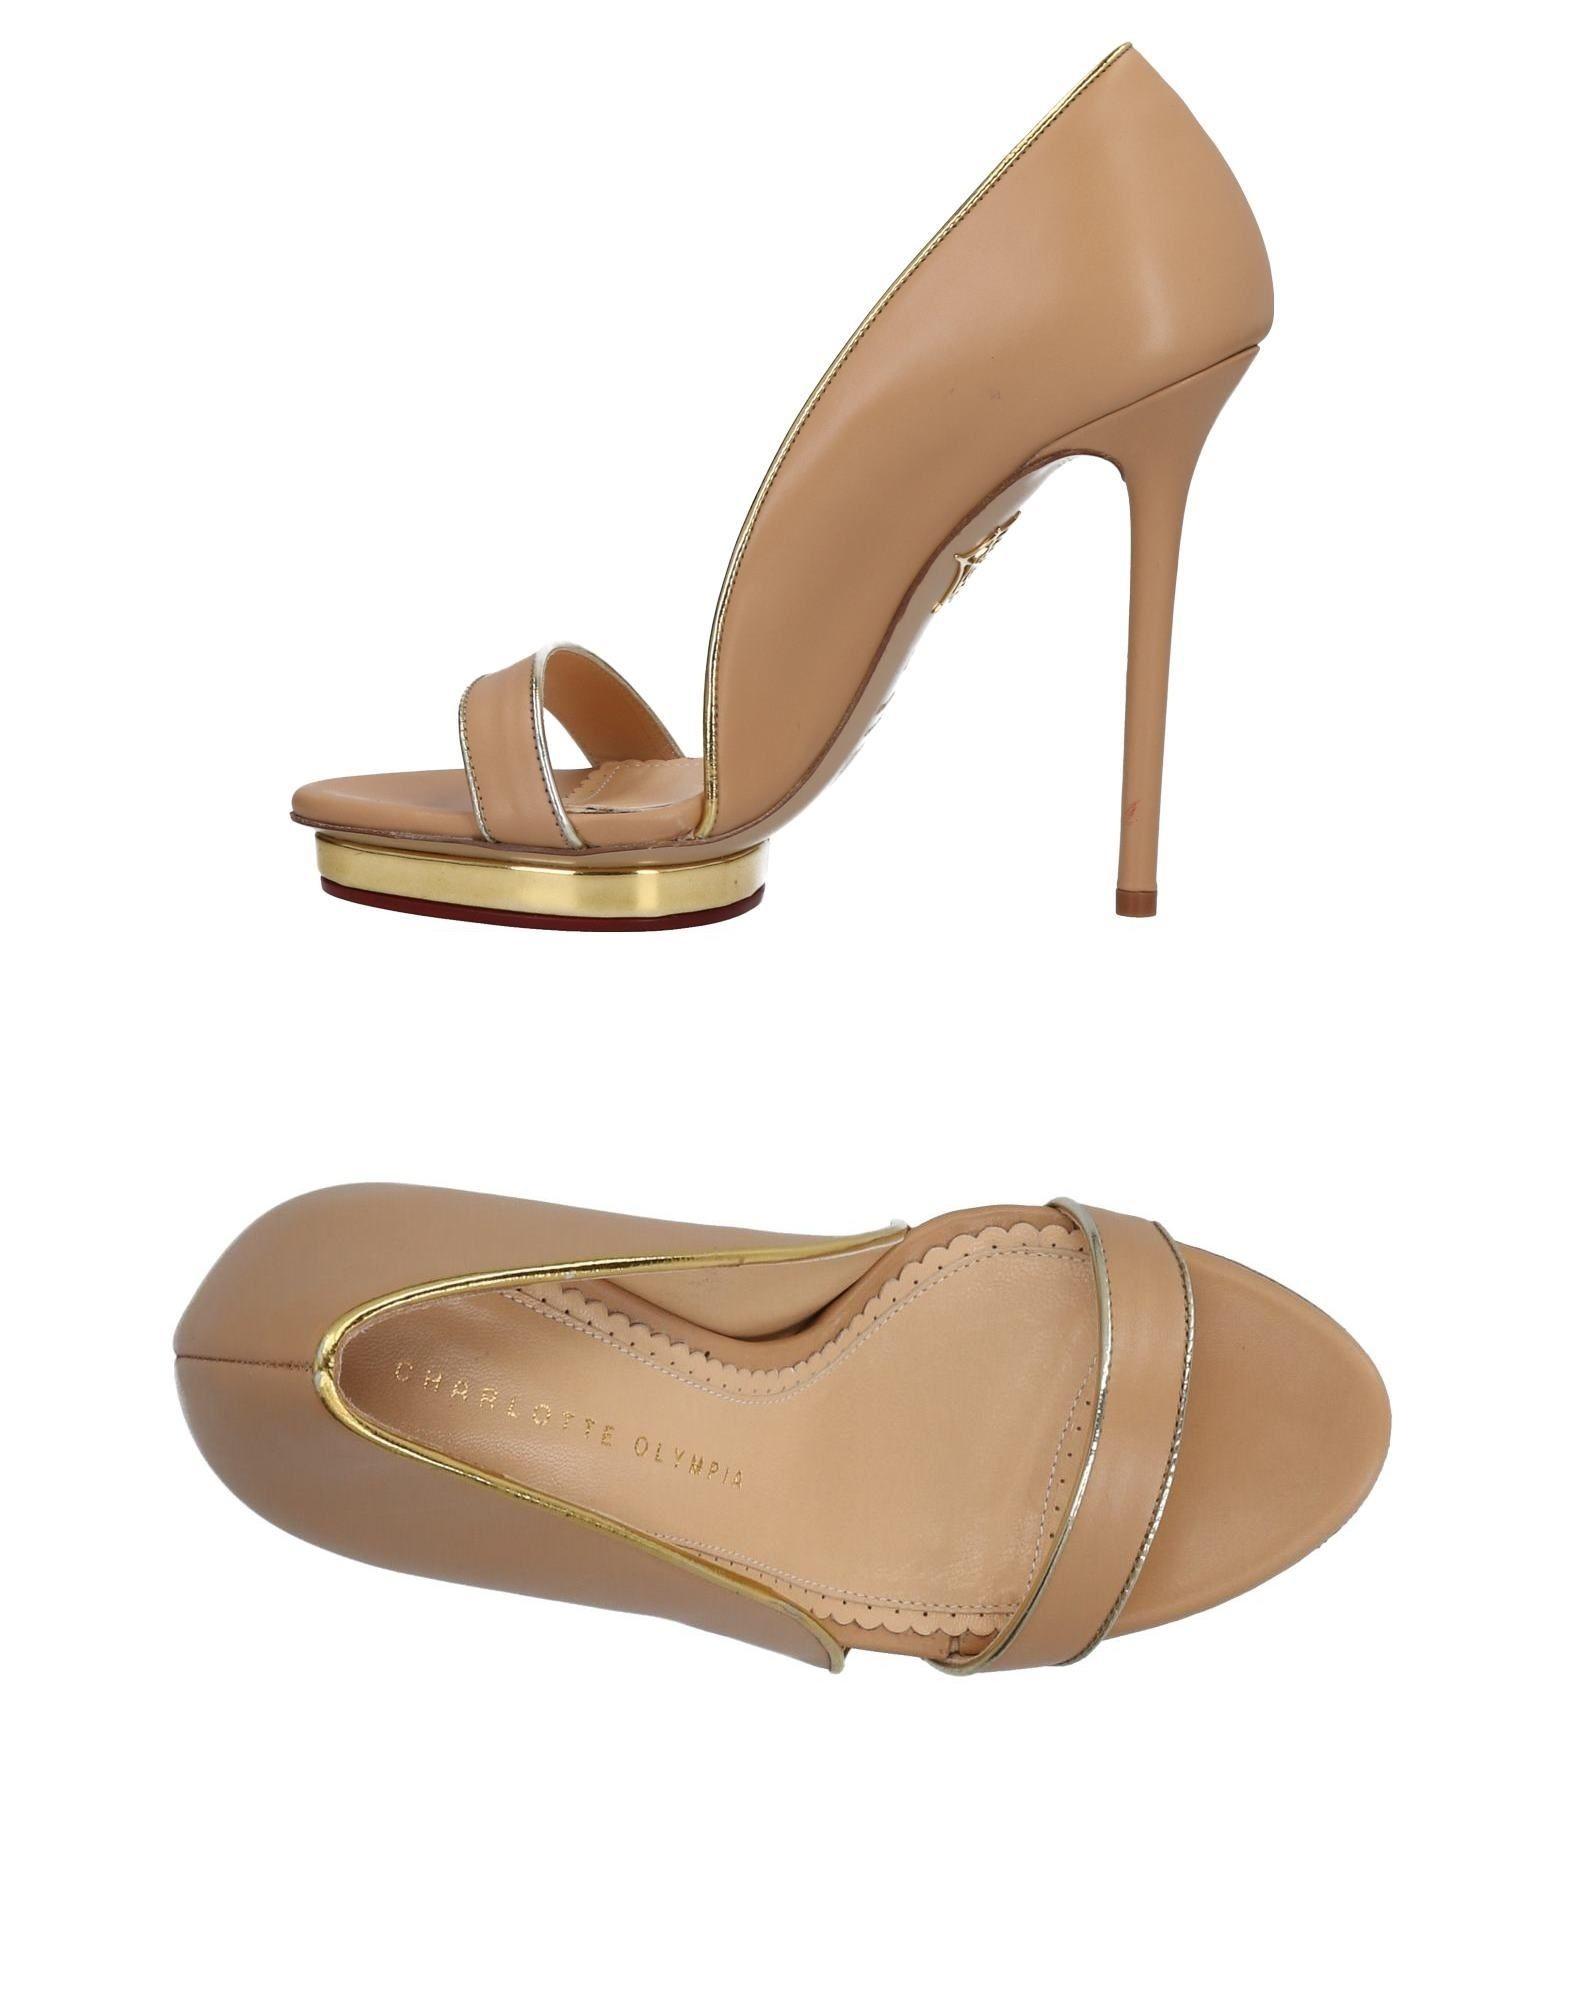 Rabatt Schuhe Charlotte Olympia Pumps Damen  11476104UG